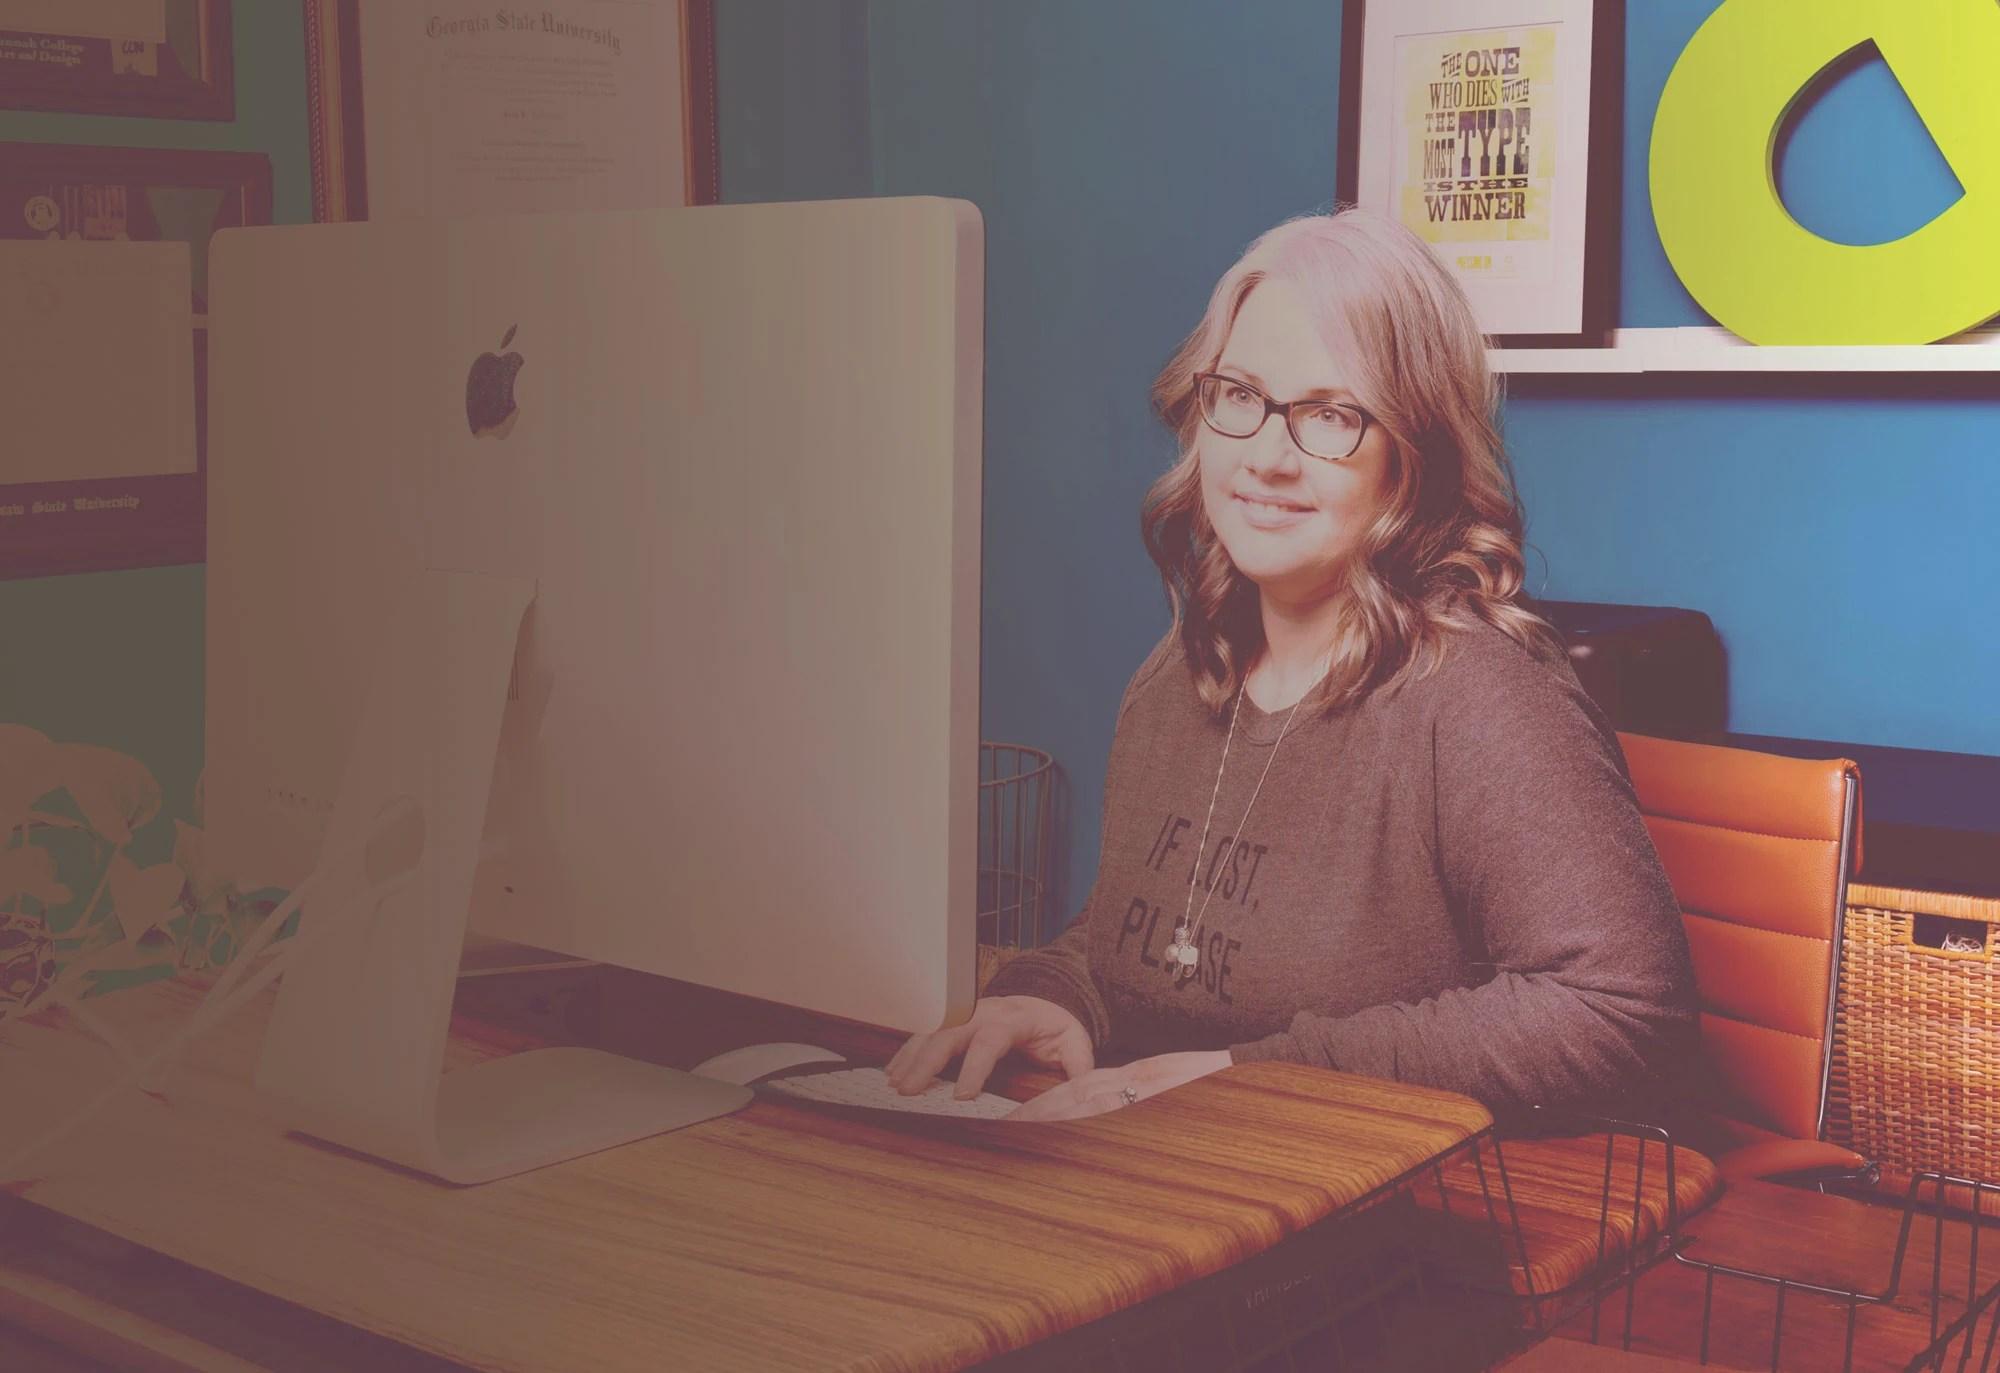 Jill Anderson WordPress designer sitting at computer